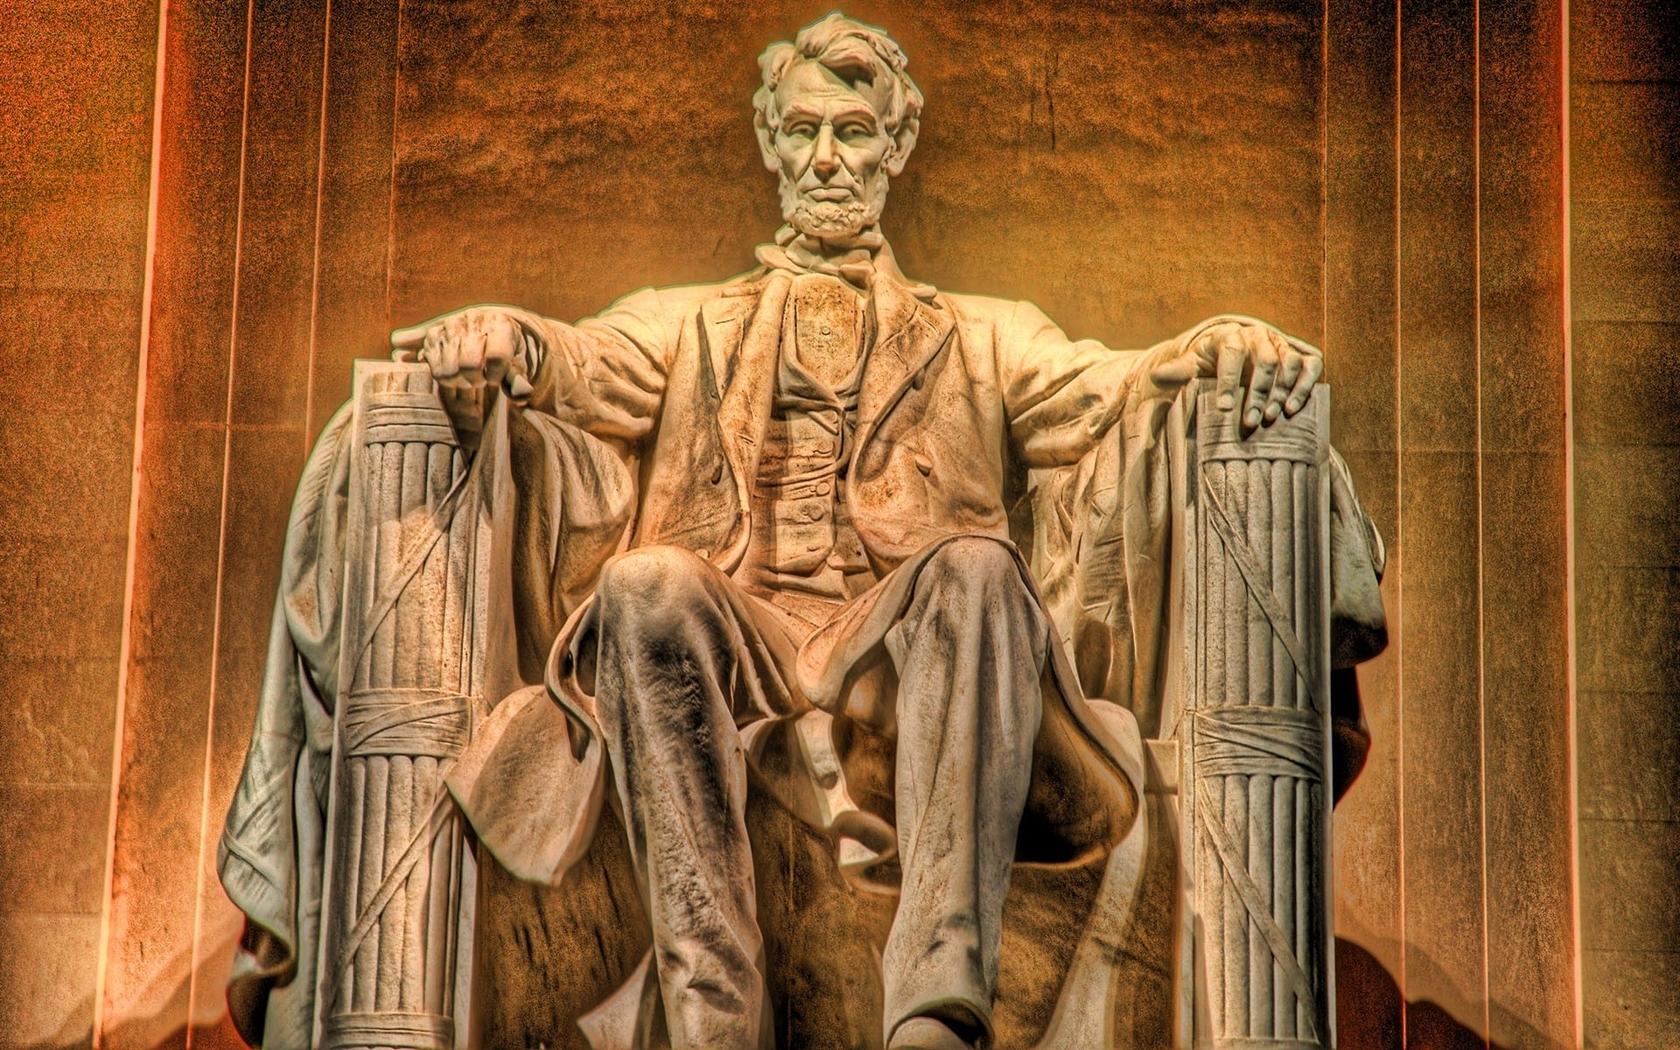 Statue of Abraham Lincoln wallpaper 23120 1680x1050